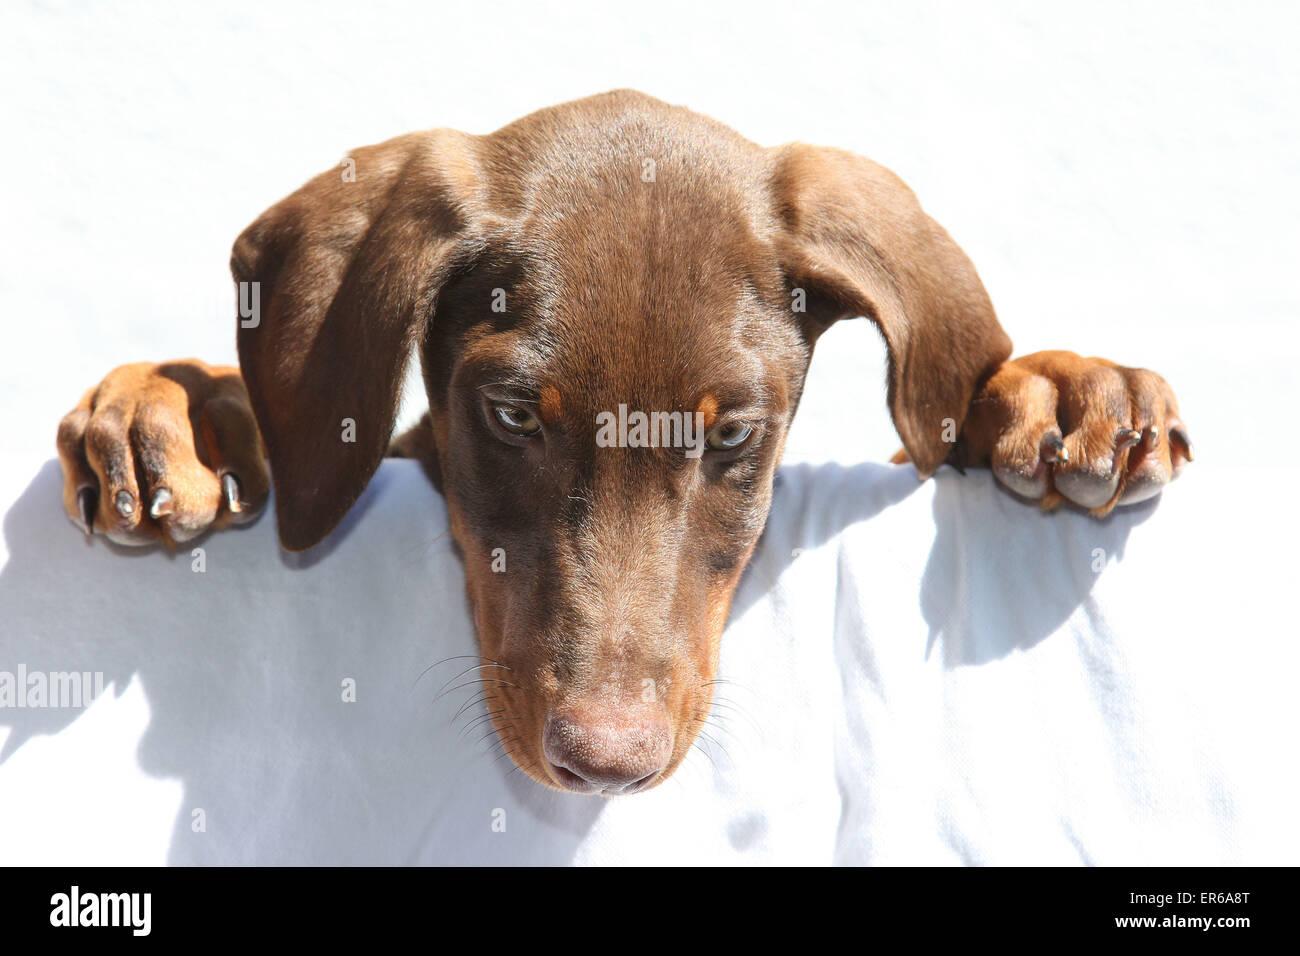 Doberman puppy - Stock Image